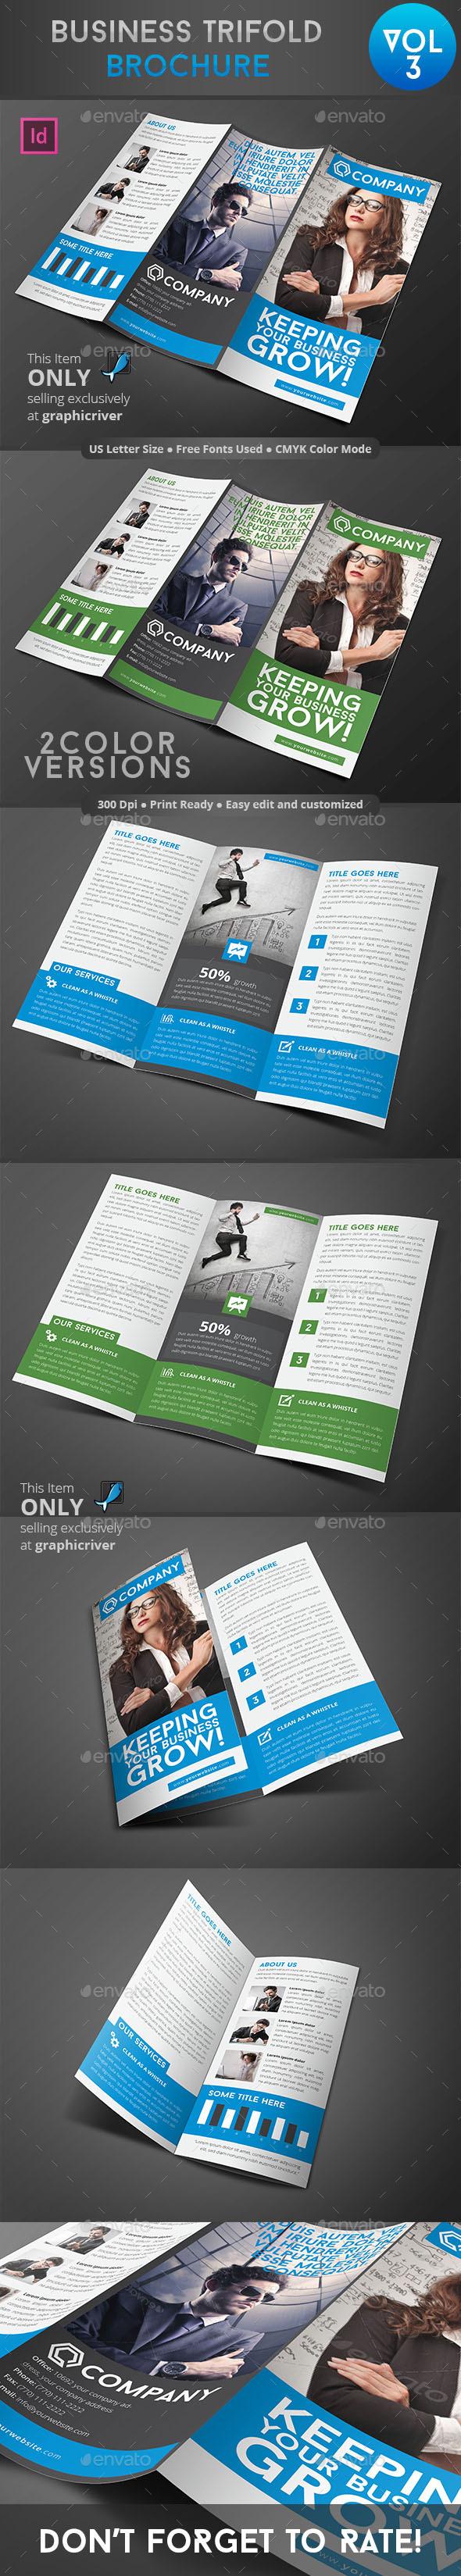 Business Trifold Brochure Vol 3 - Informational Brochures